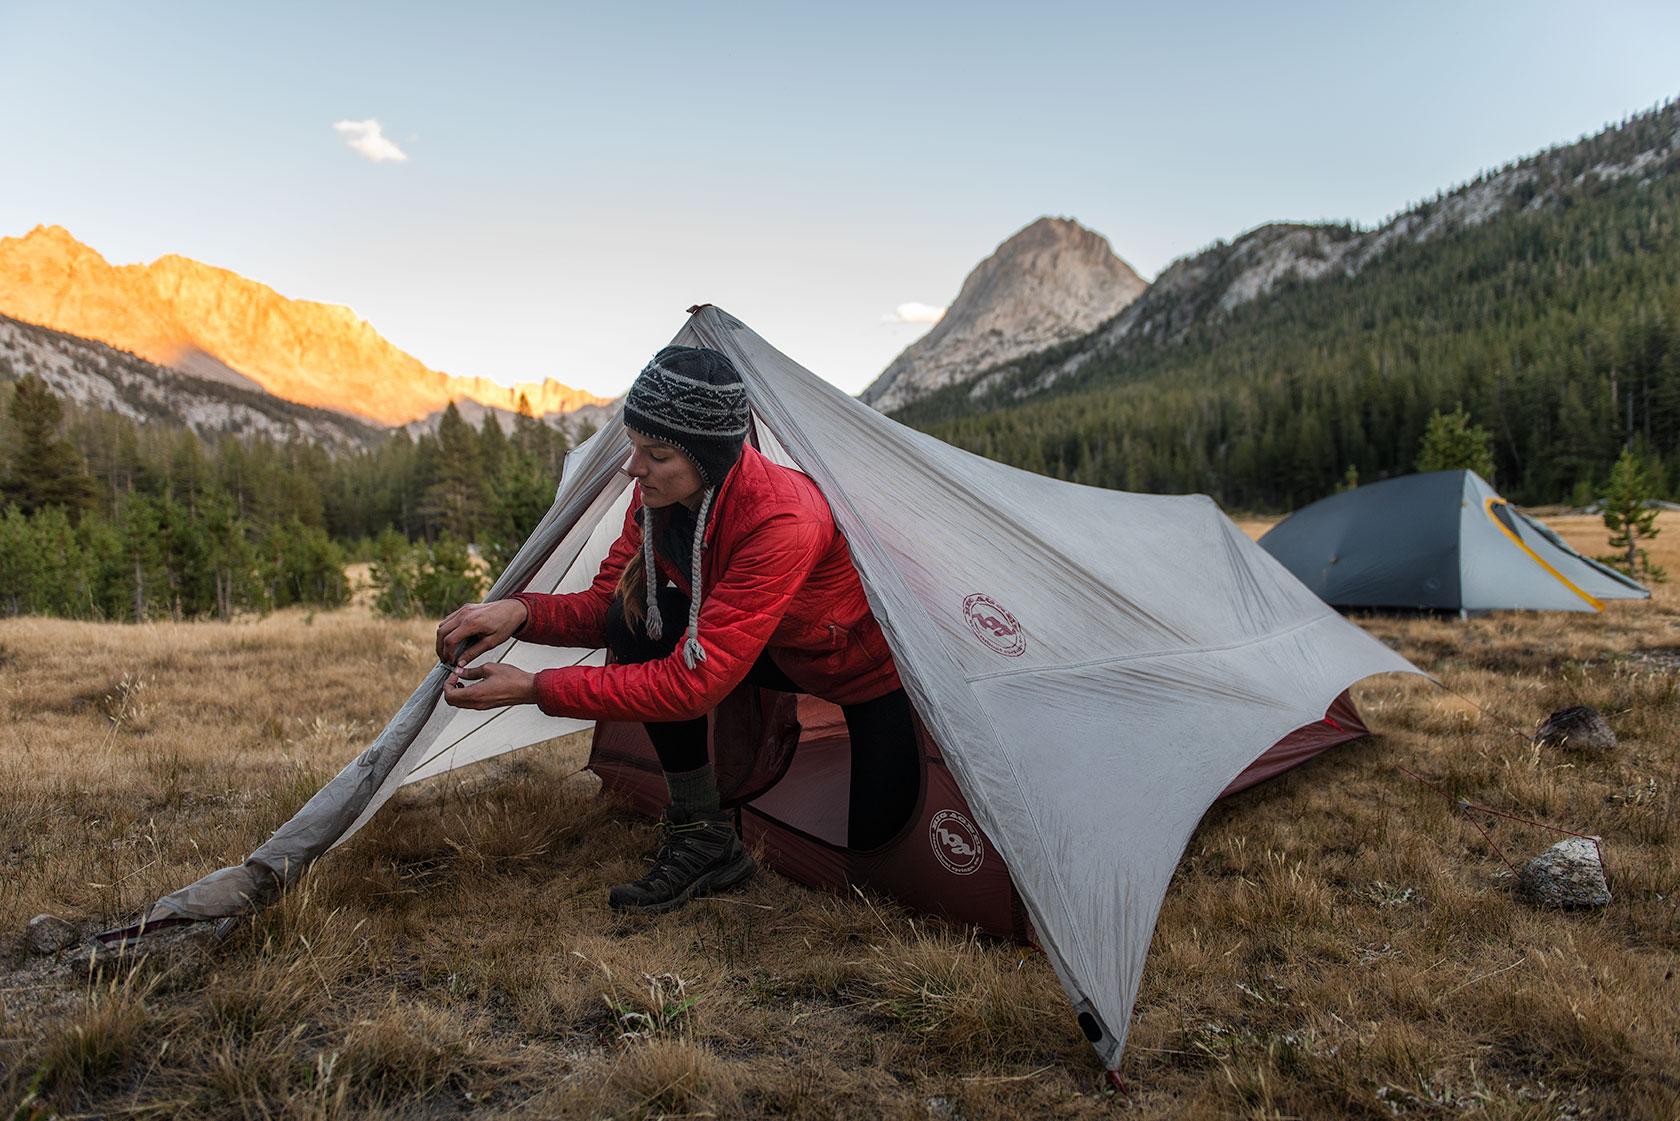 austin-trigg-big-agnes-tent-john-muir-trail-camping-Evolution-Valley-sunset.jpg